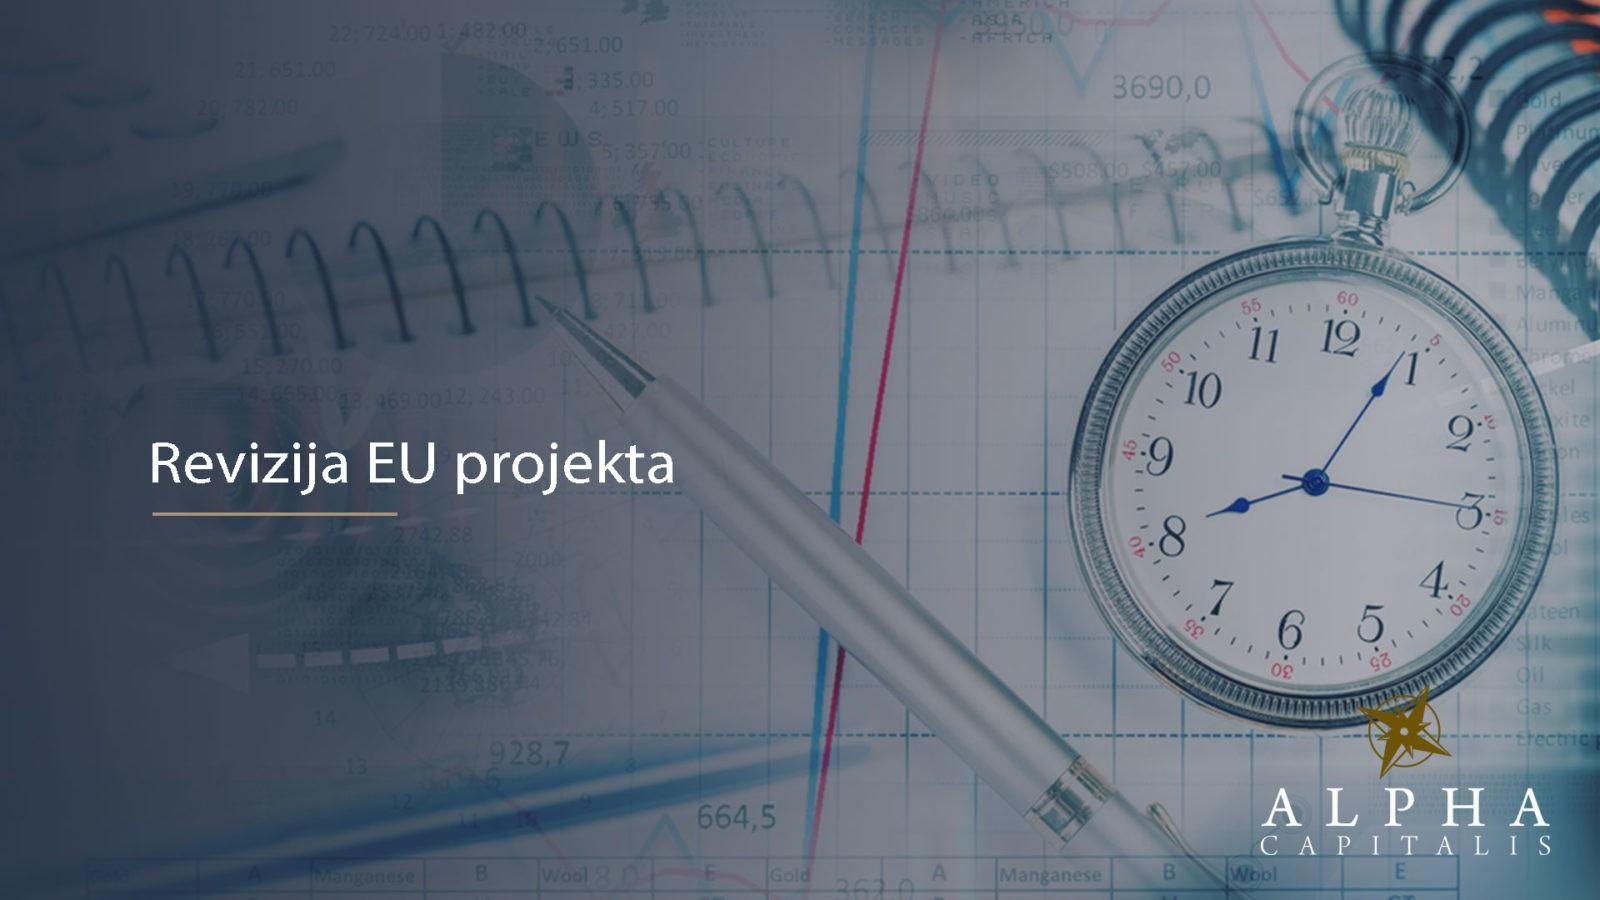 Revizija EU projekata 2019 03 25 - Revizija EU projekta